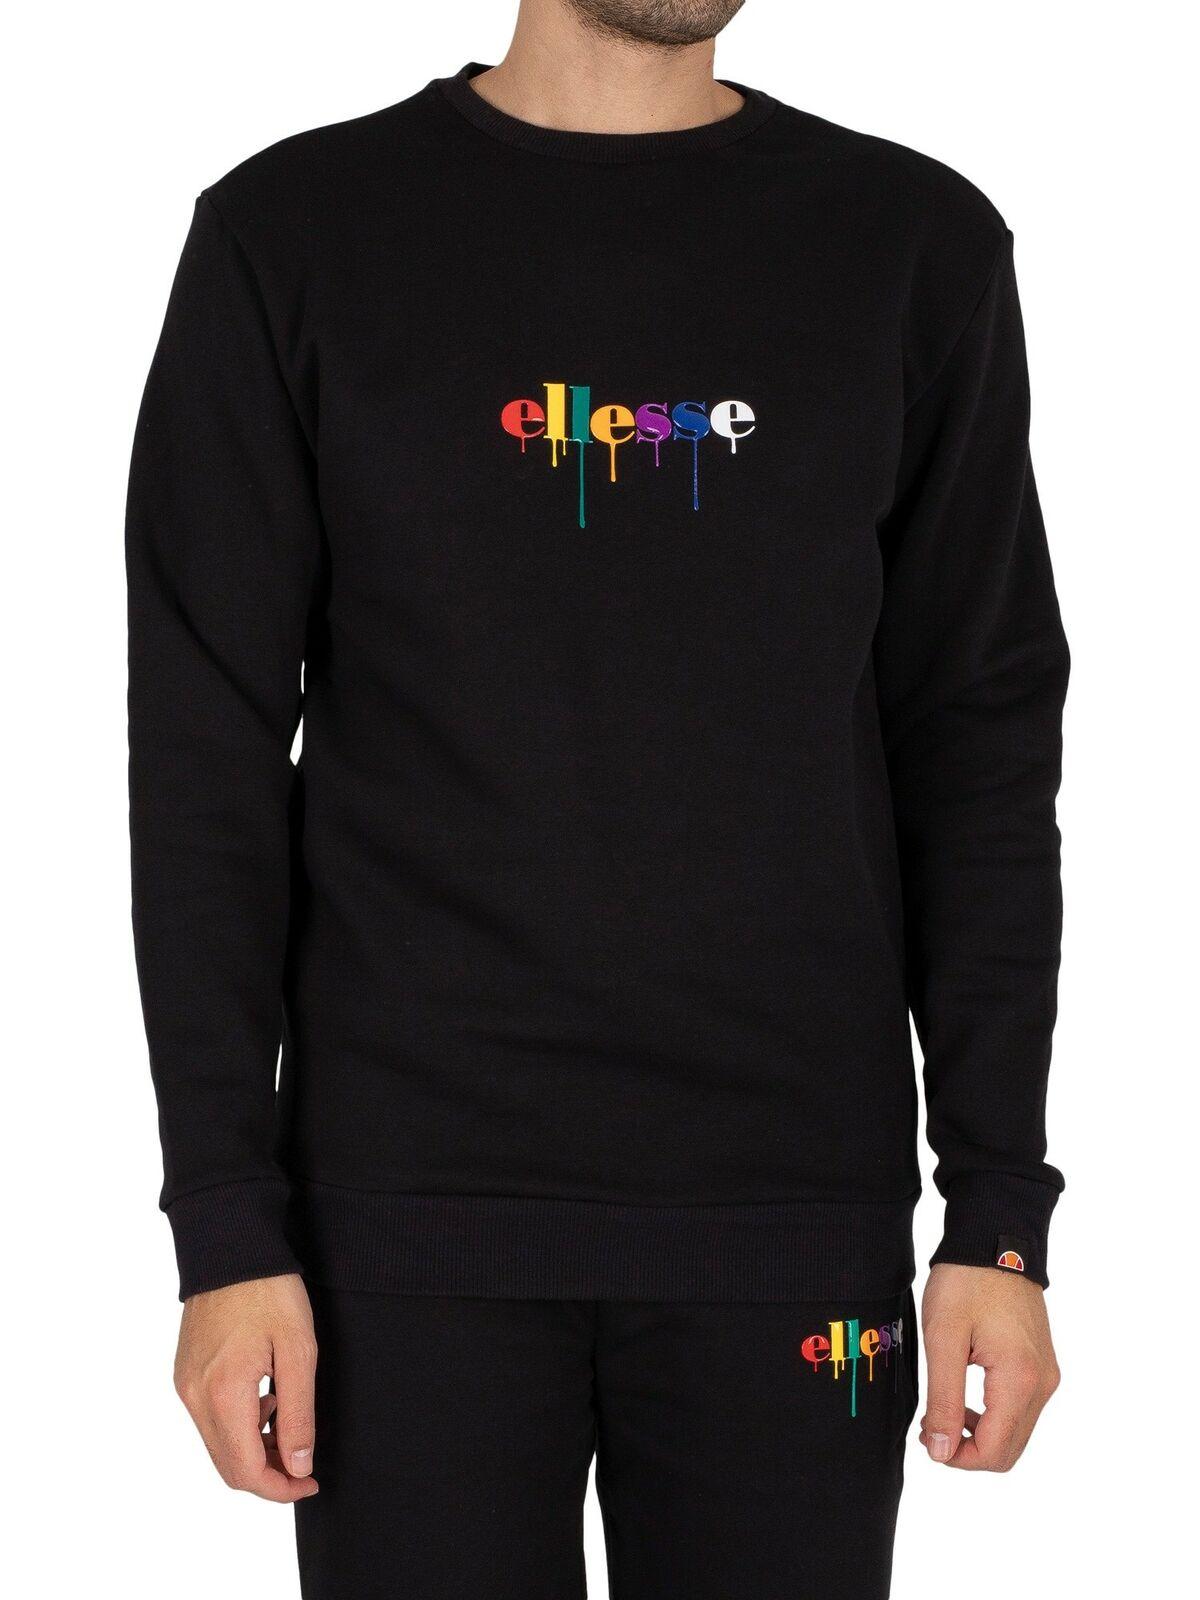 Ellesse Men's Todravi Sweatshirt, Black